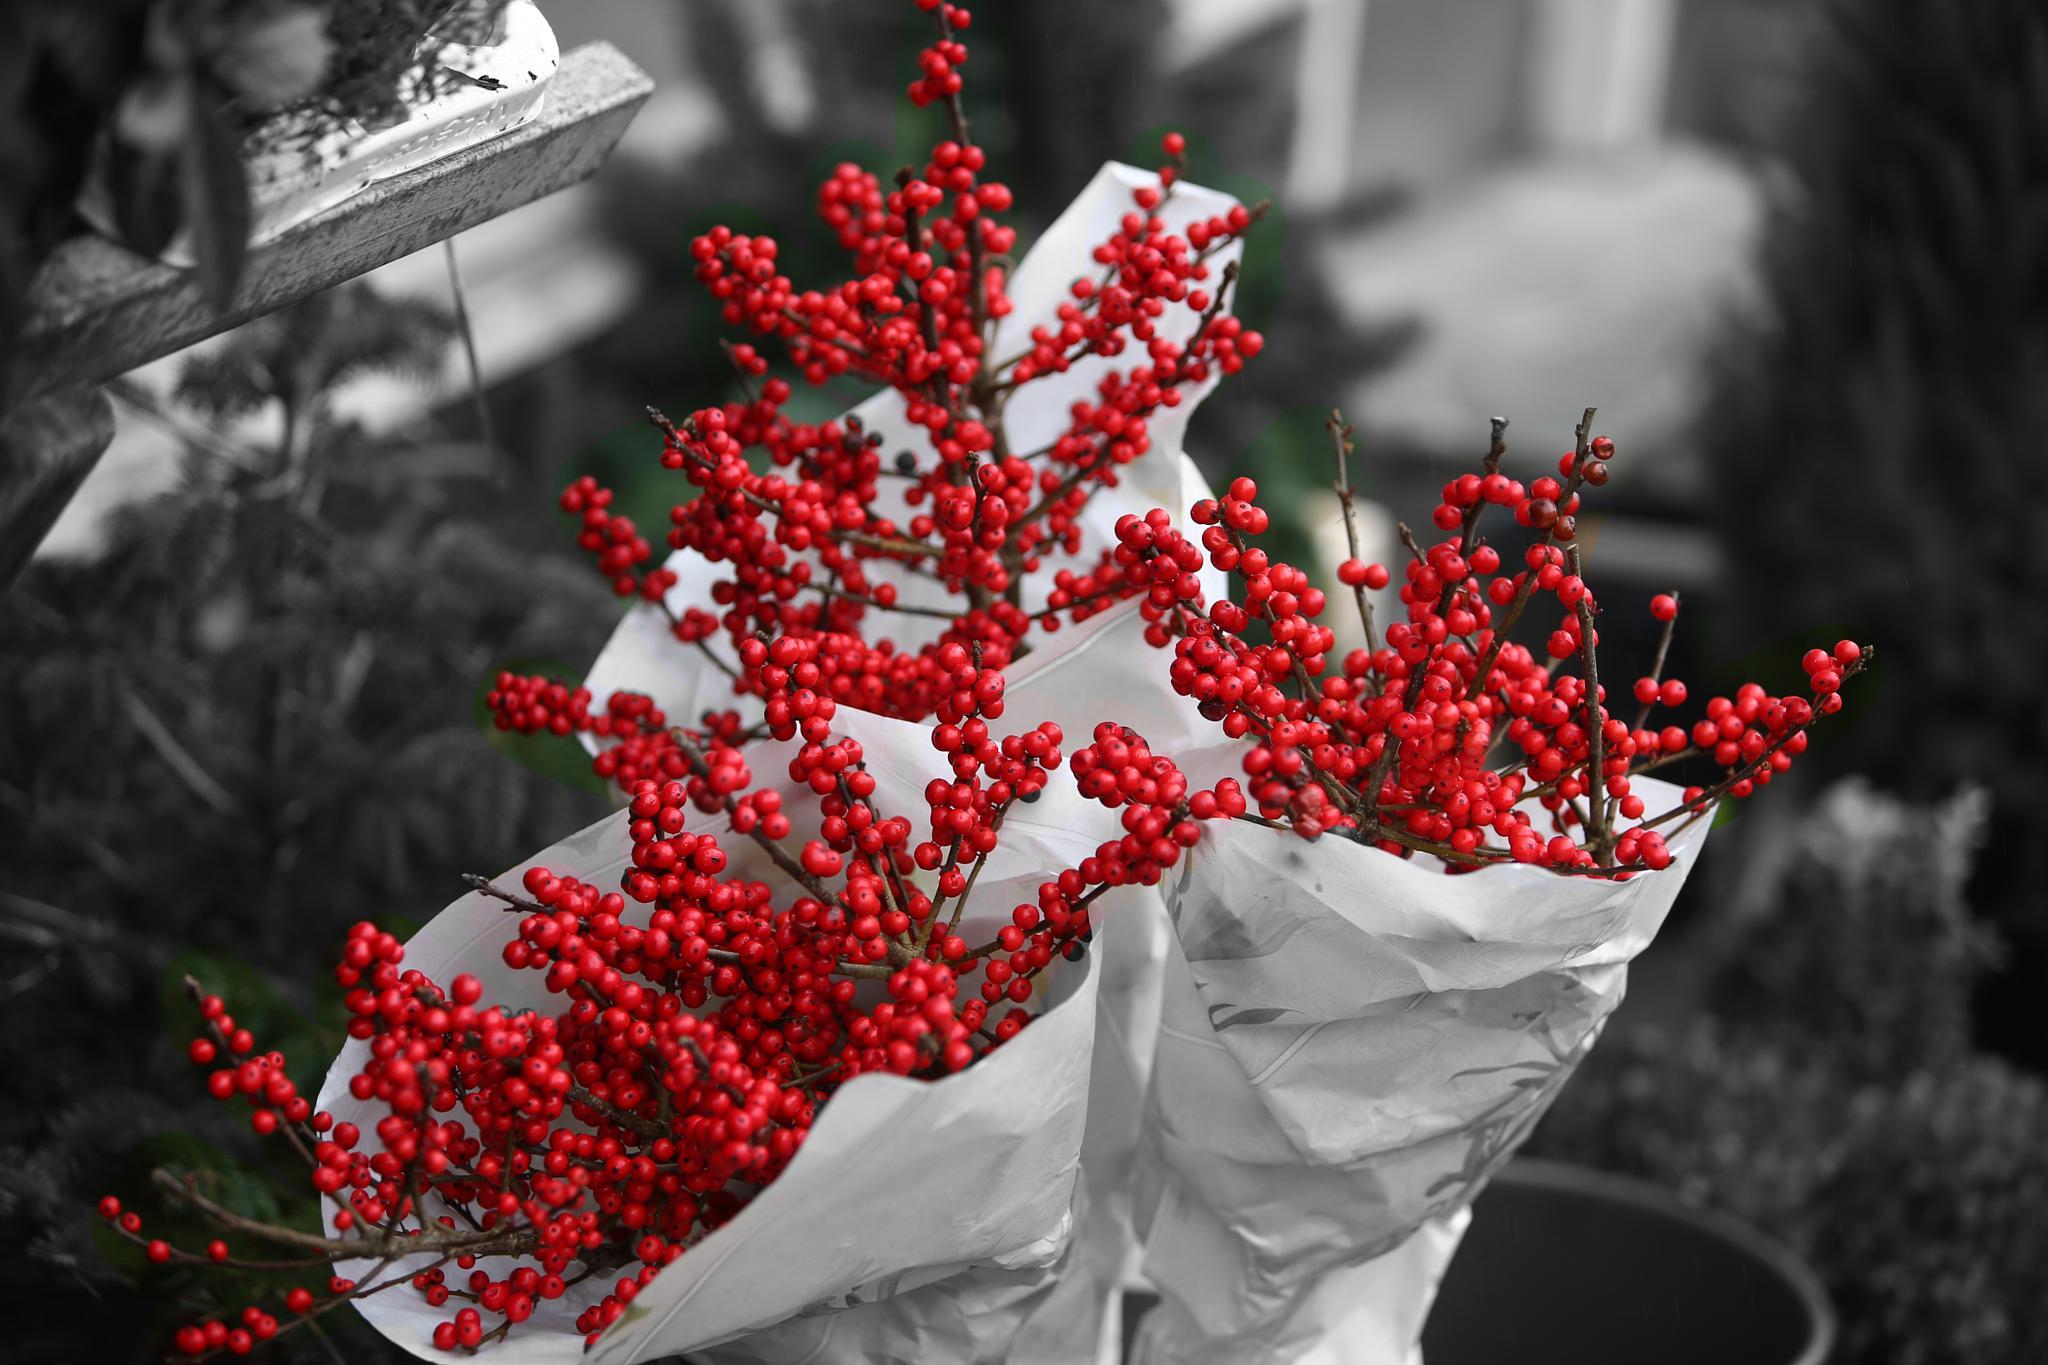 Blomster by Mogens Petersen